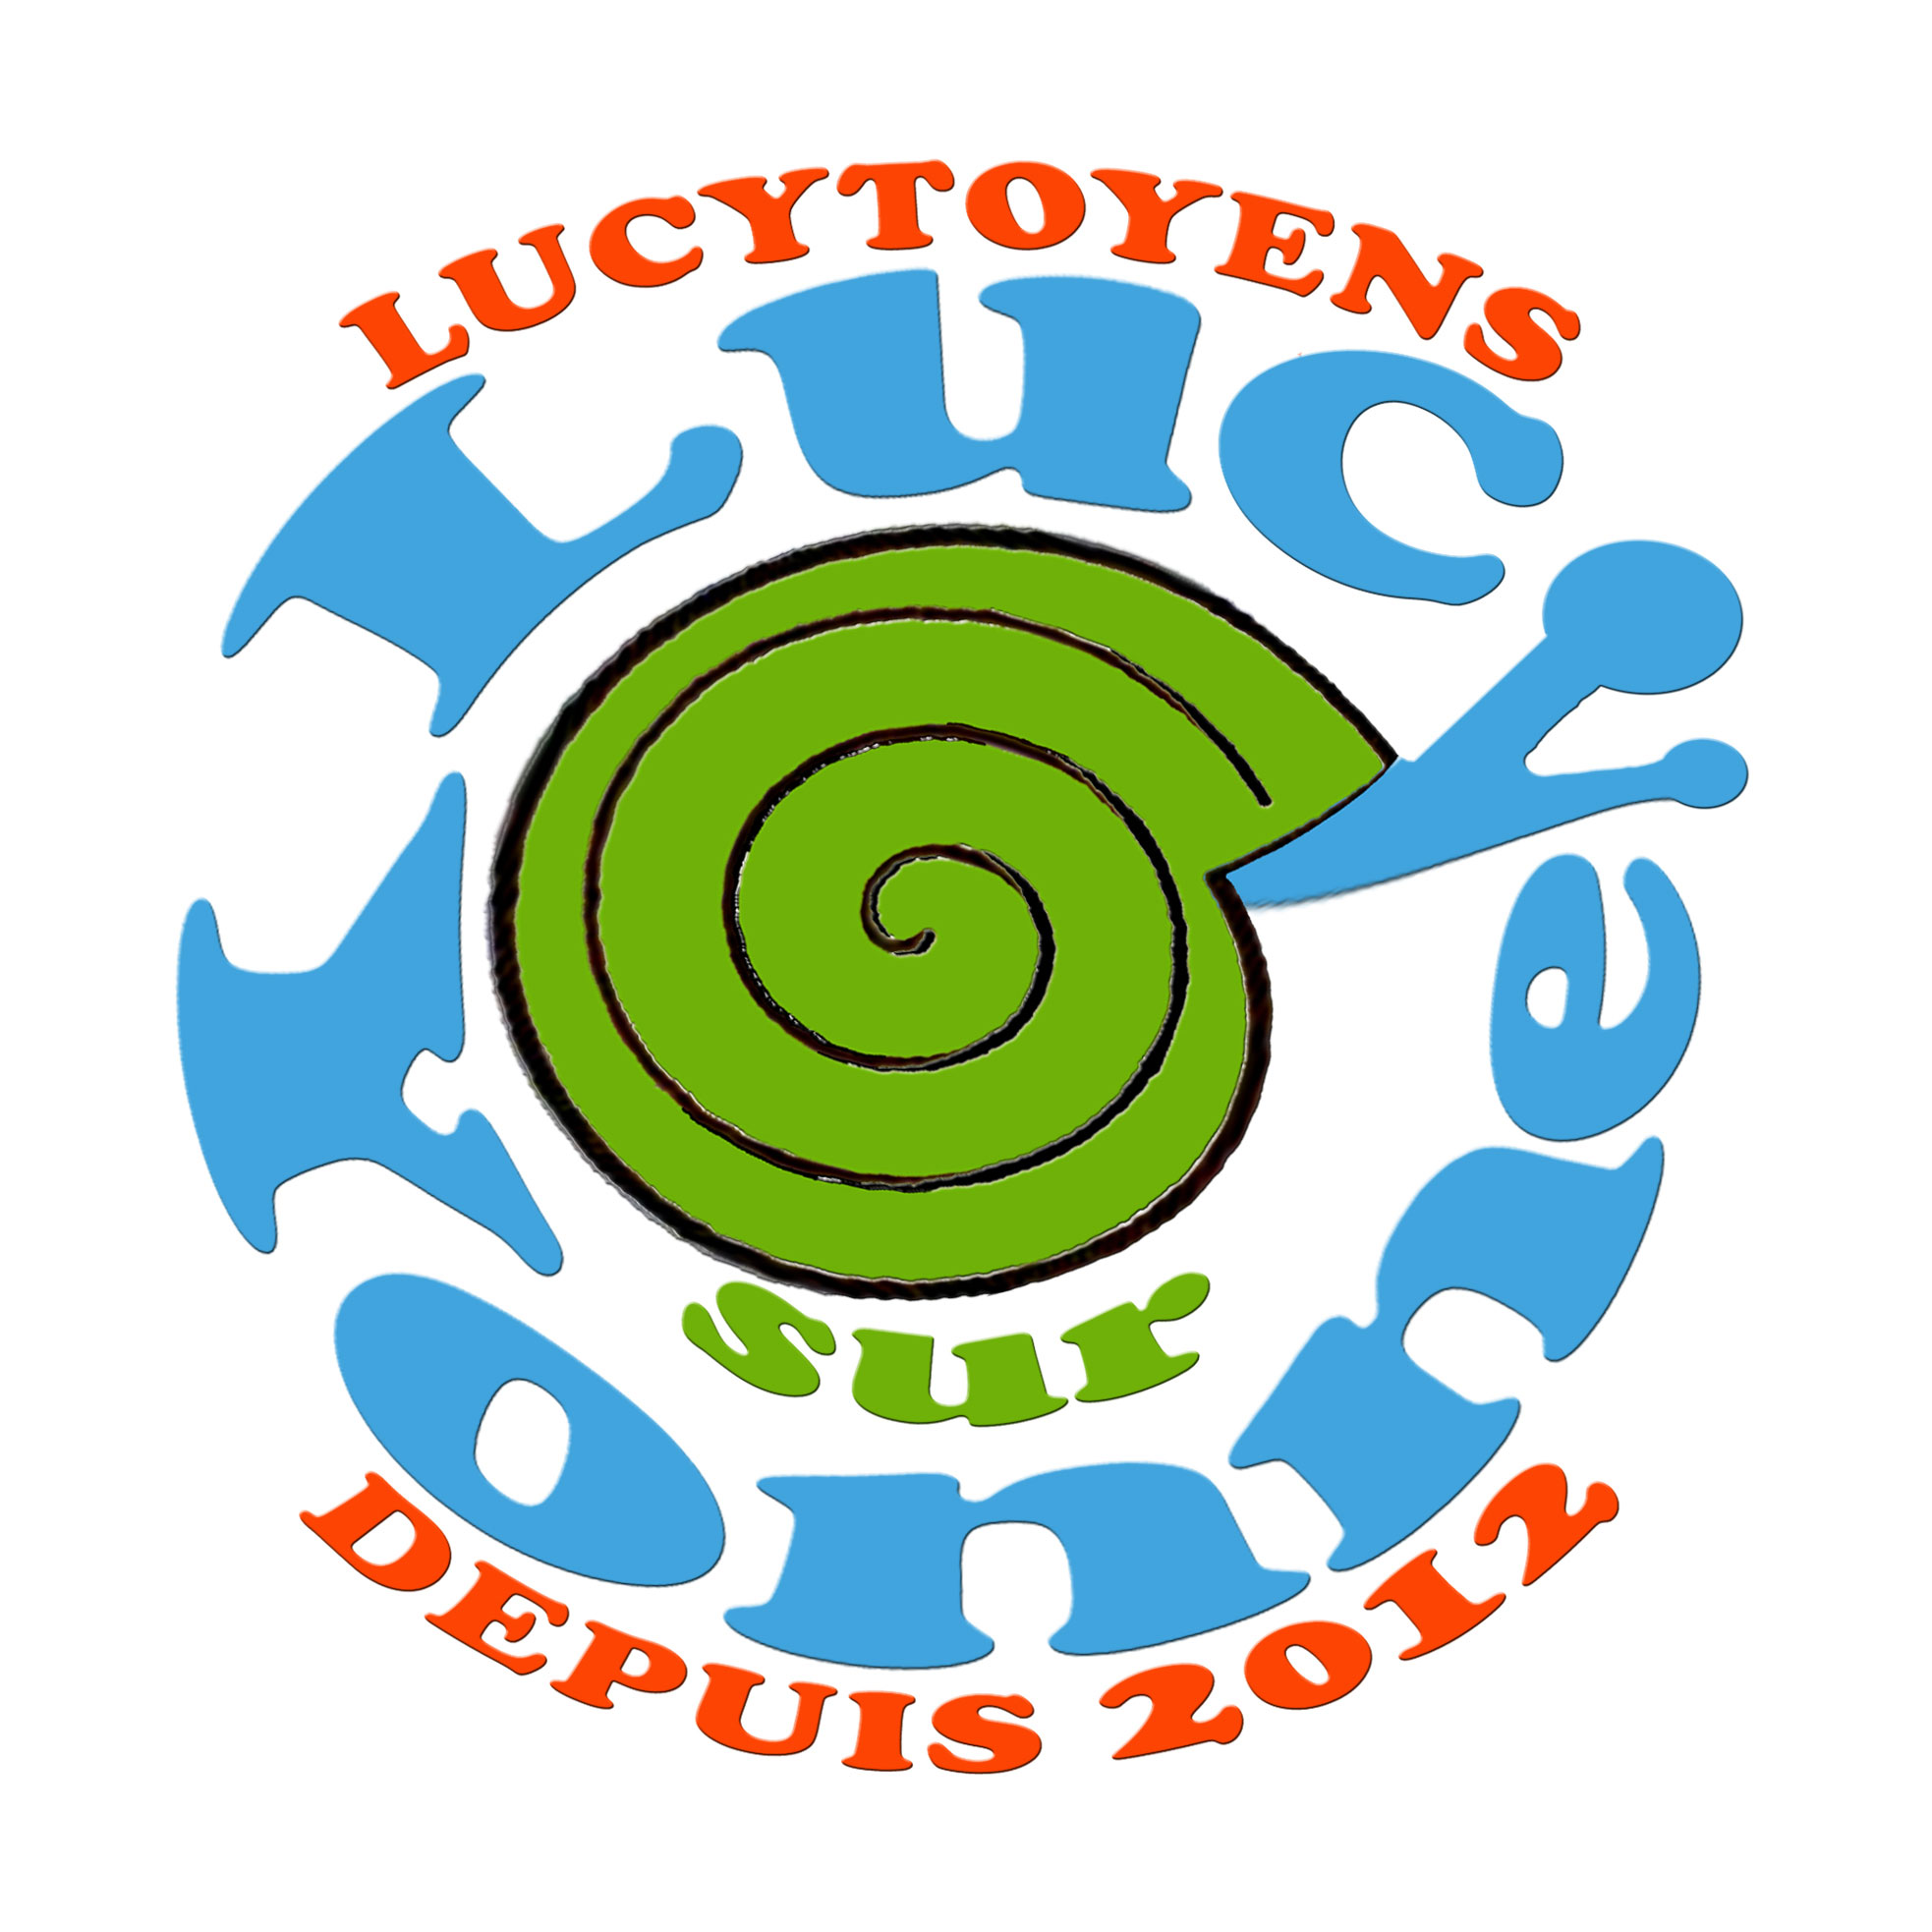 Association - Lucytoyens